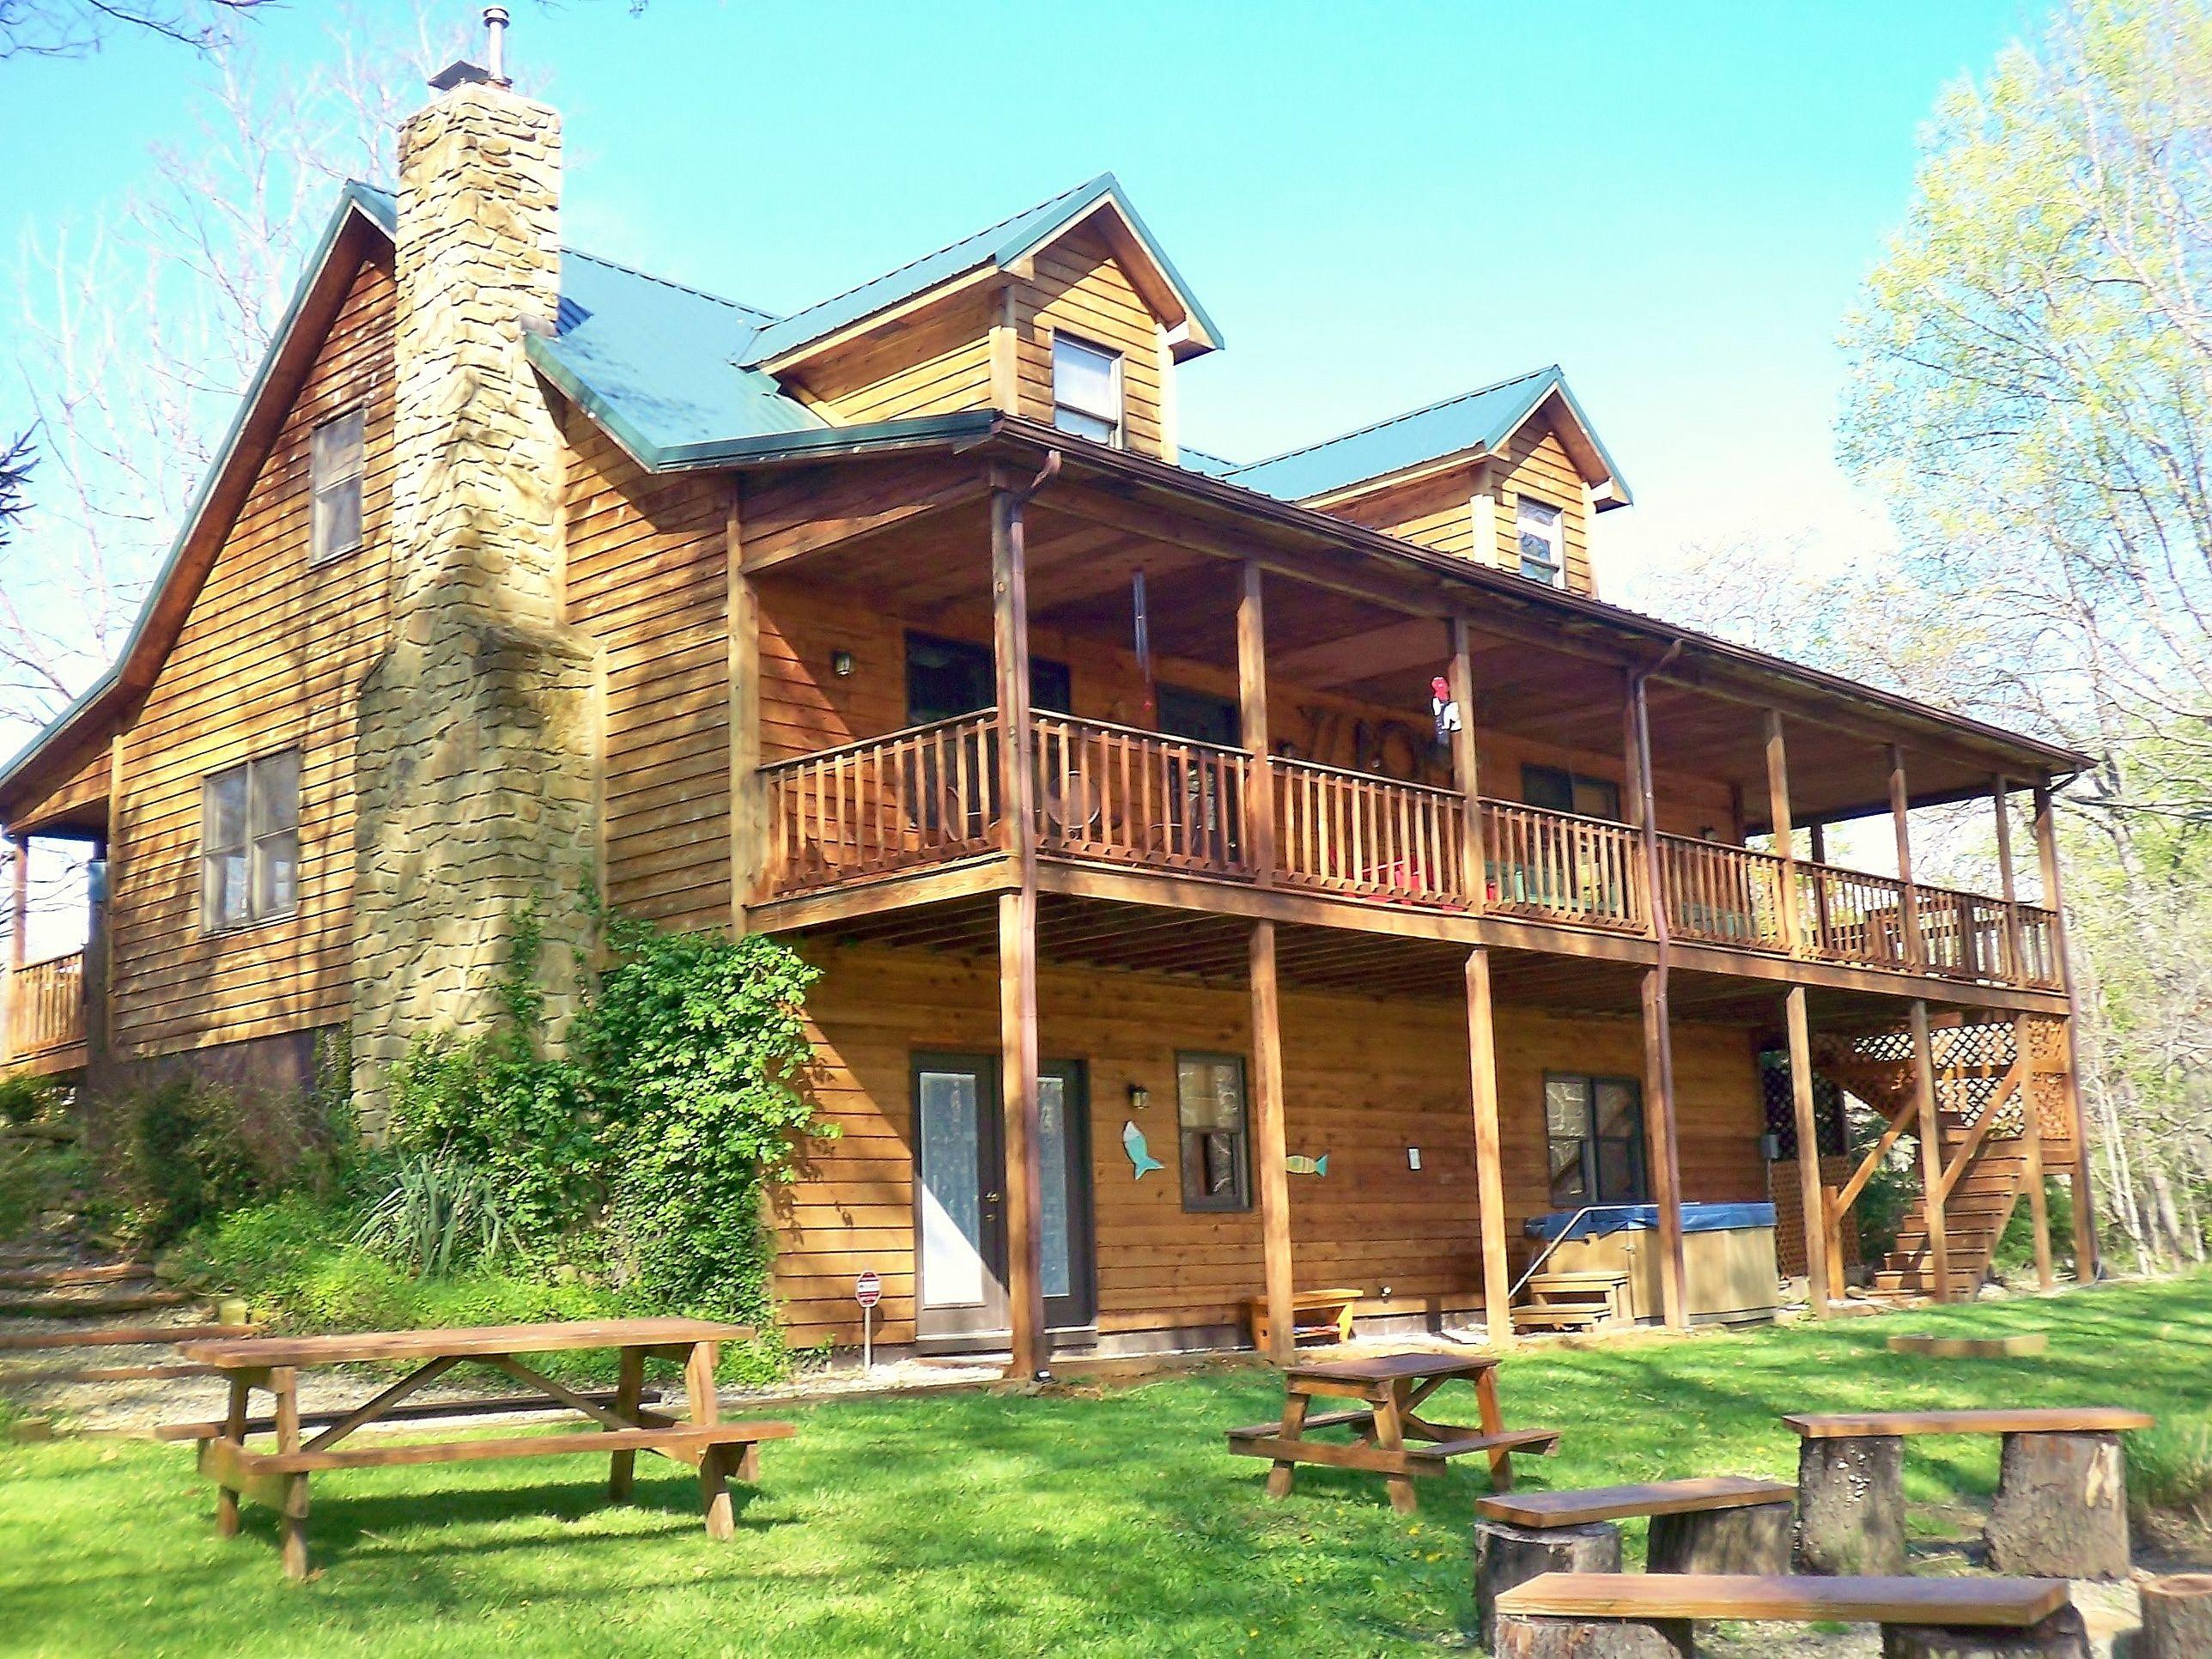 Enchanted Lake Lodge, a vacation rental in beautiful Brown